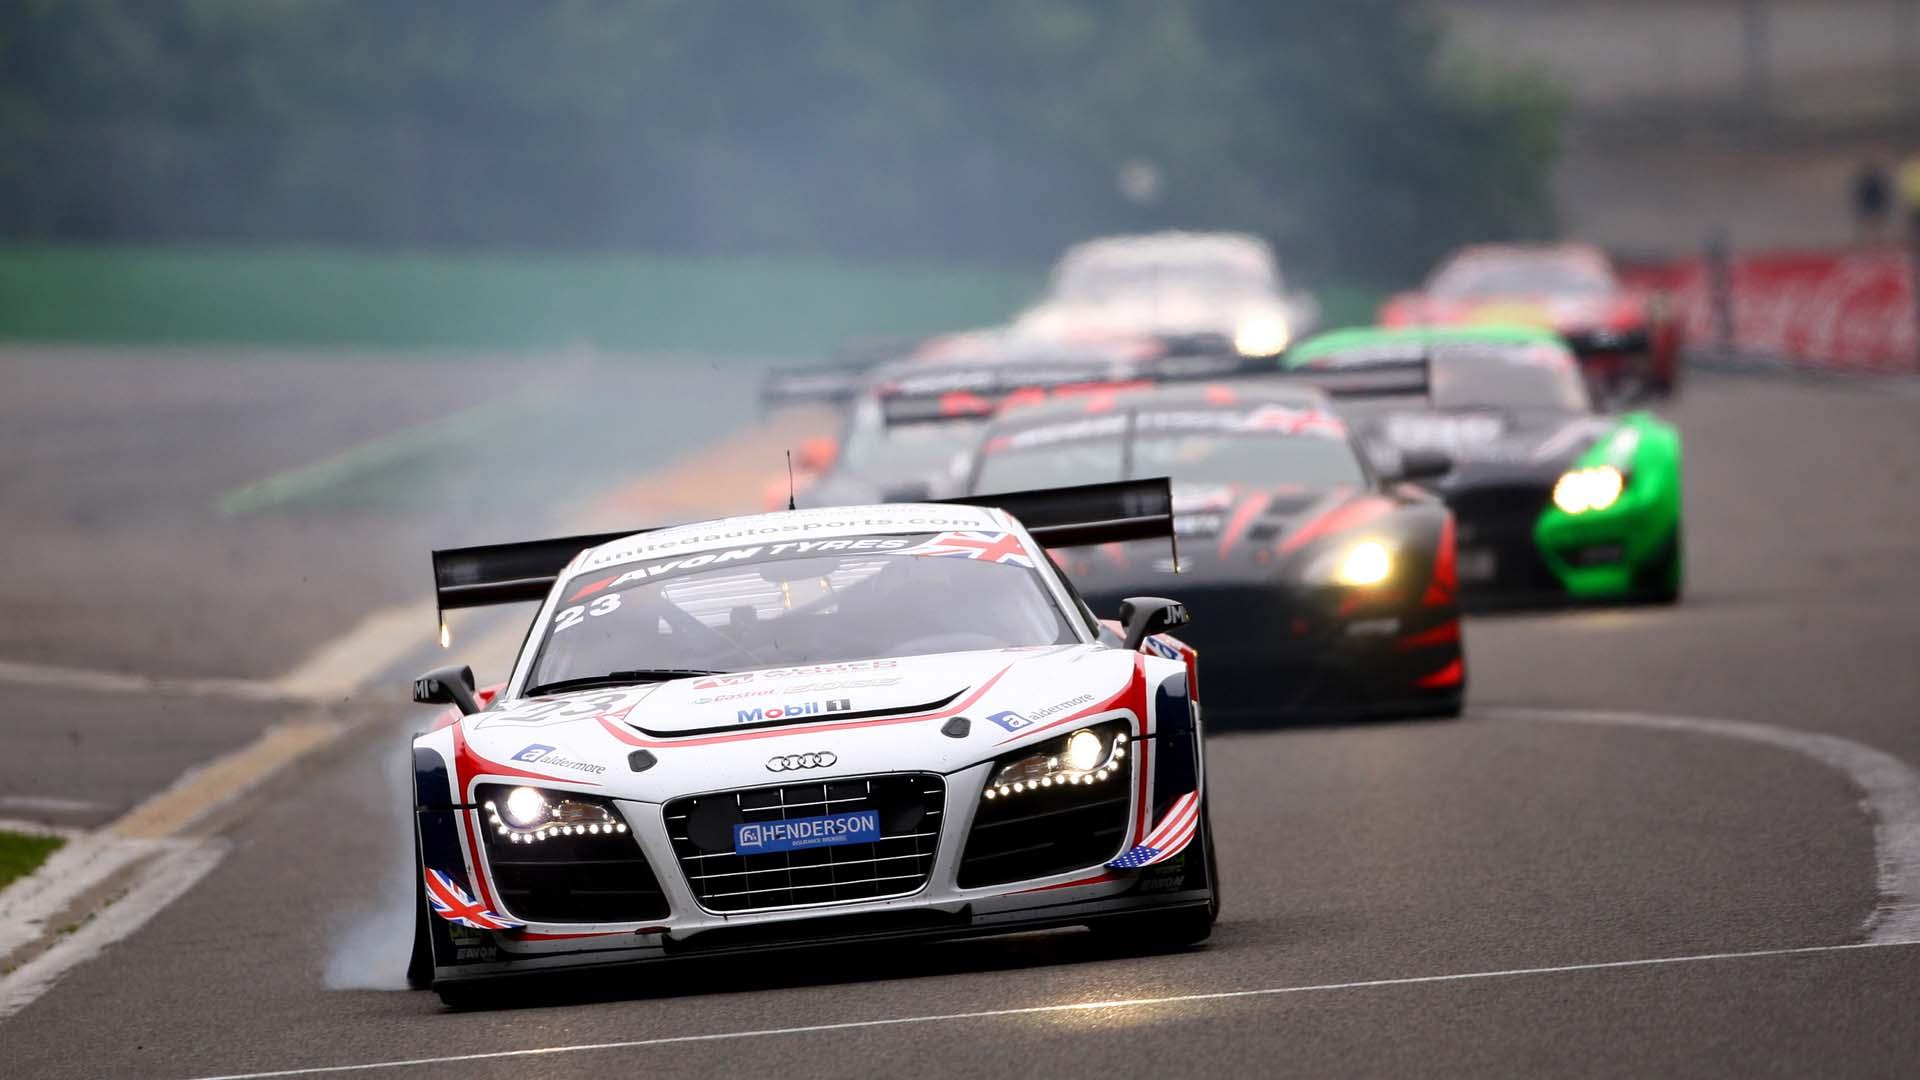 audi racing cars hd